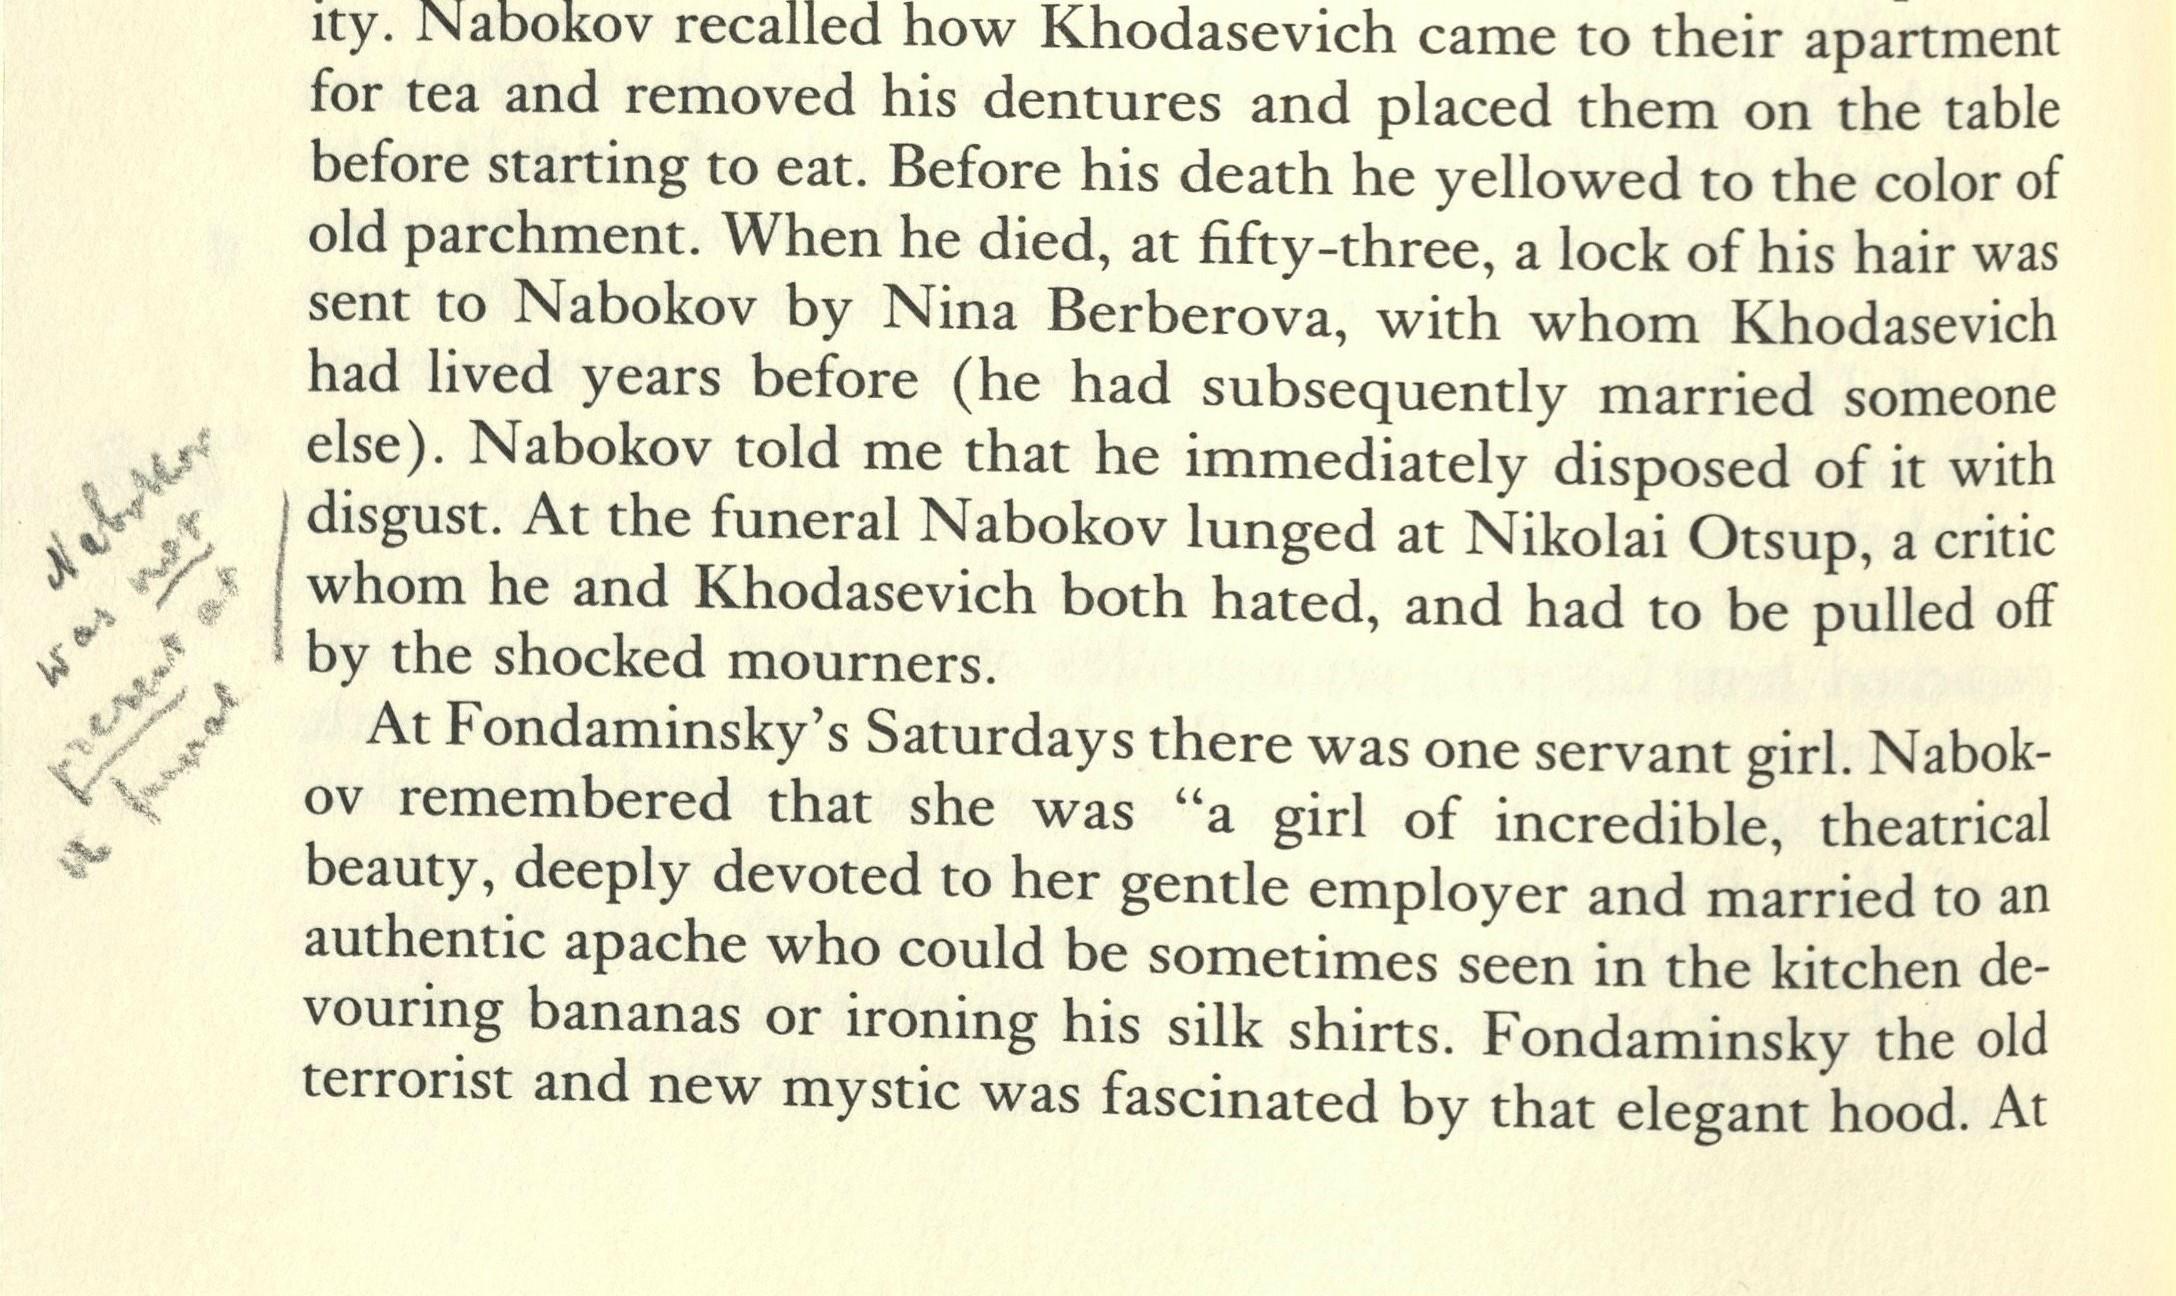 Vera disputes Nabokov's presence at a funeral.